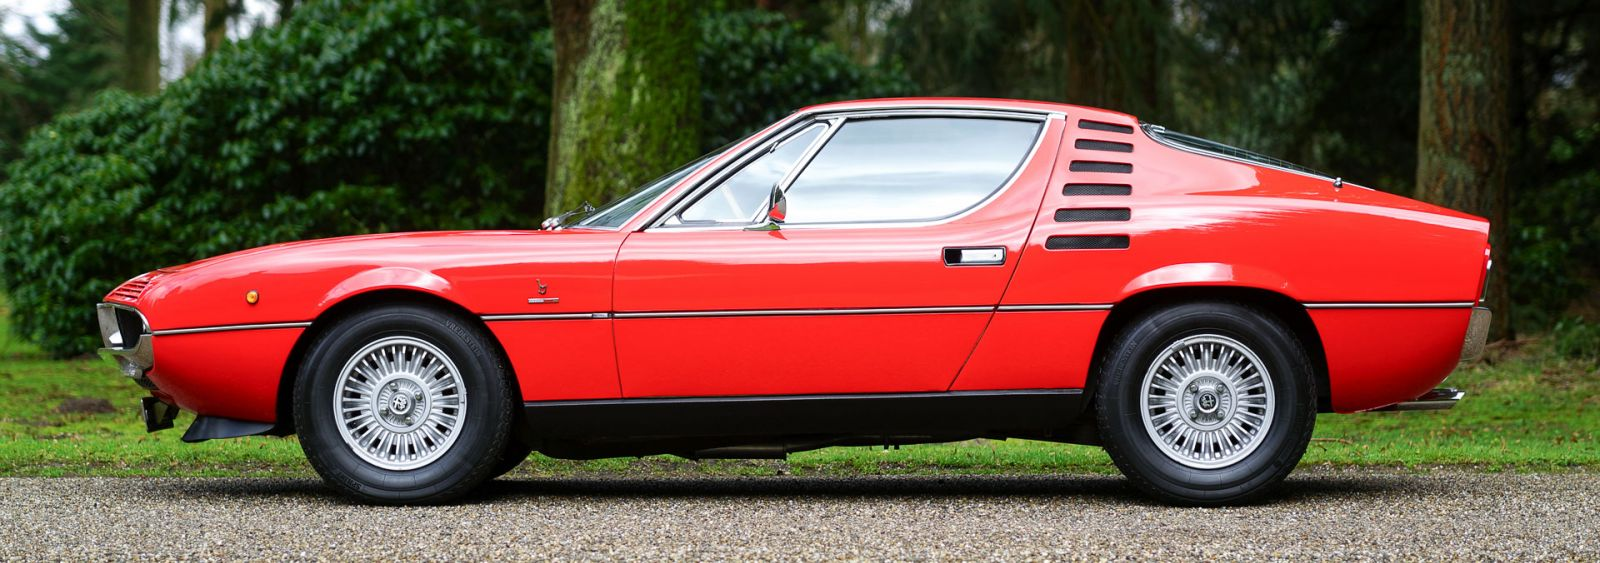 Alfa romeo montreal v8 engine for sale 15